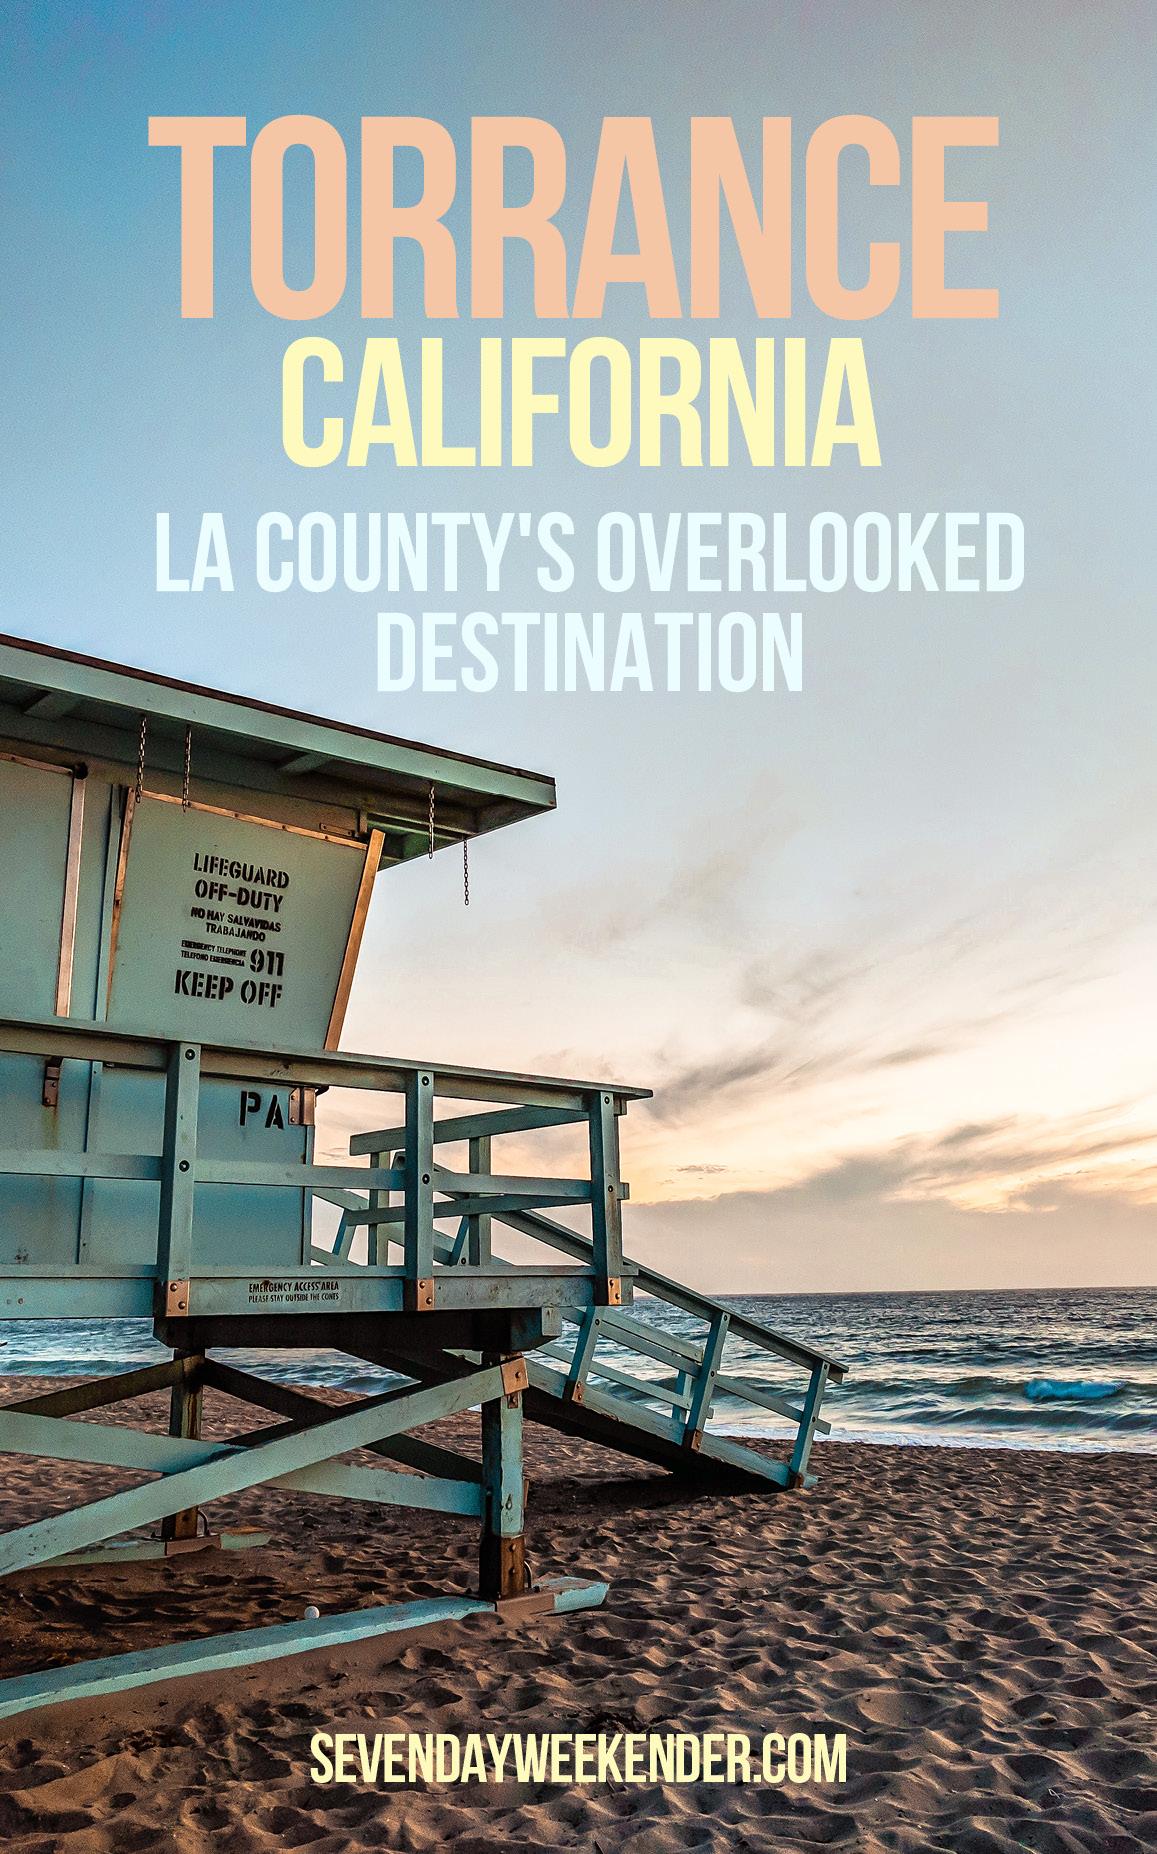 Torrance California is LA County's Overlooked Destination